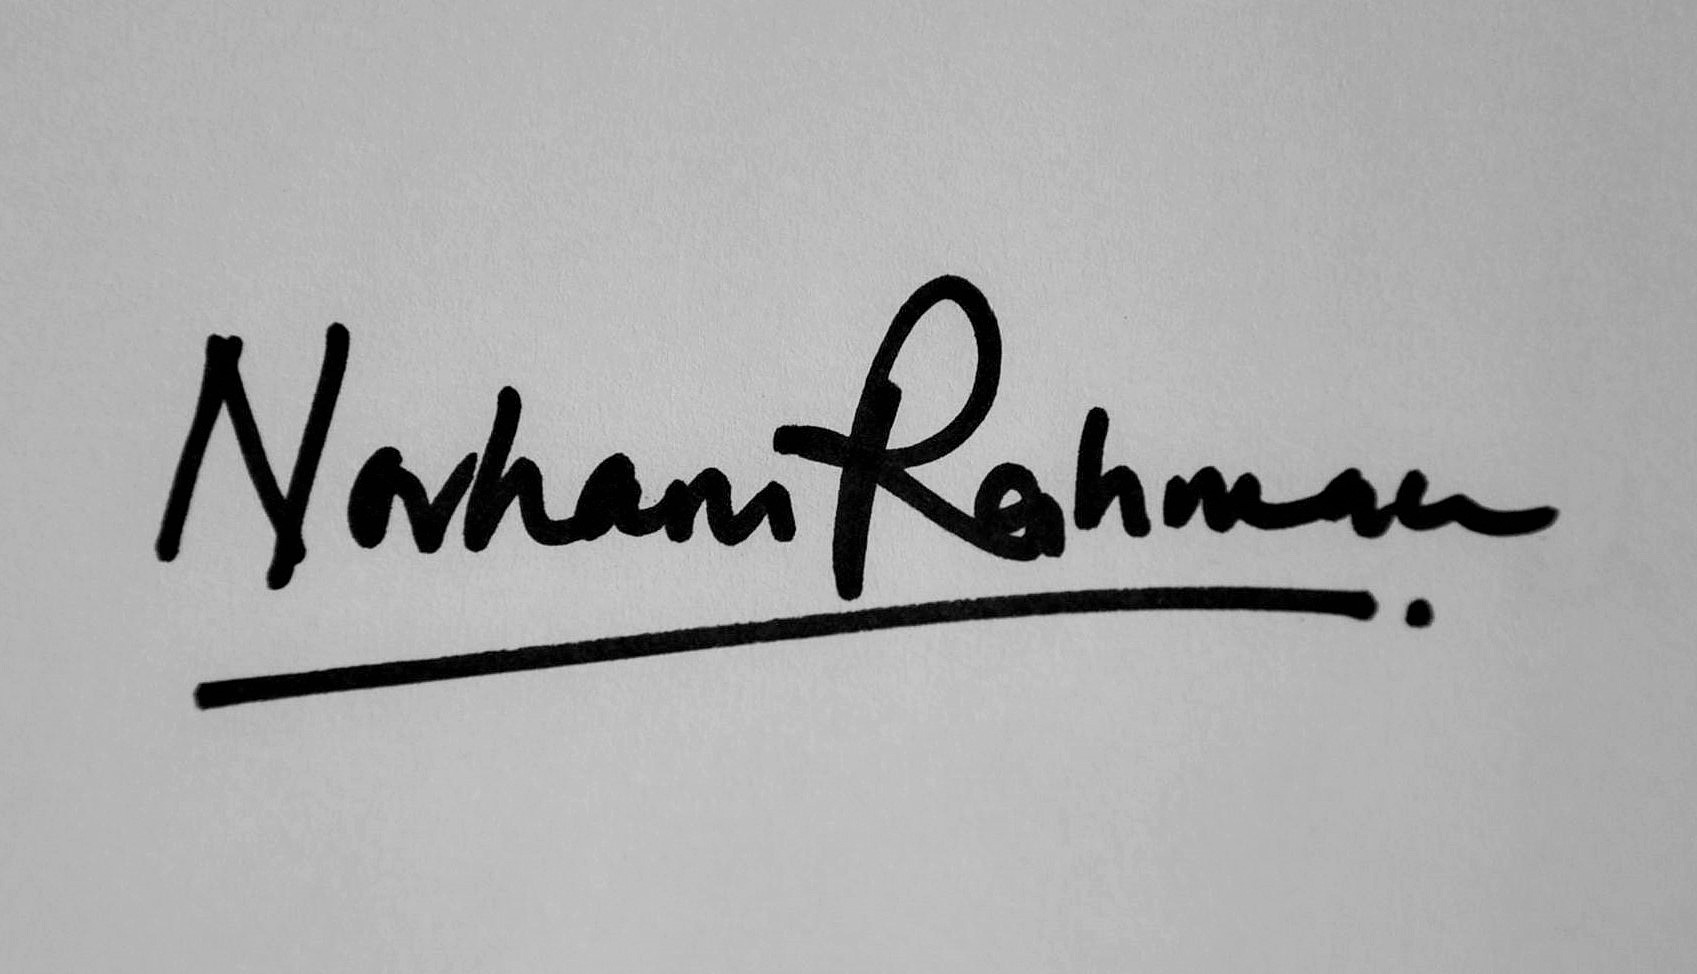 Norhani Abdul Rahman's Signature